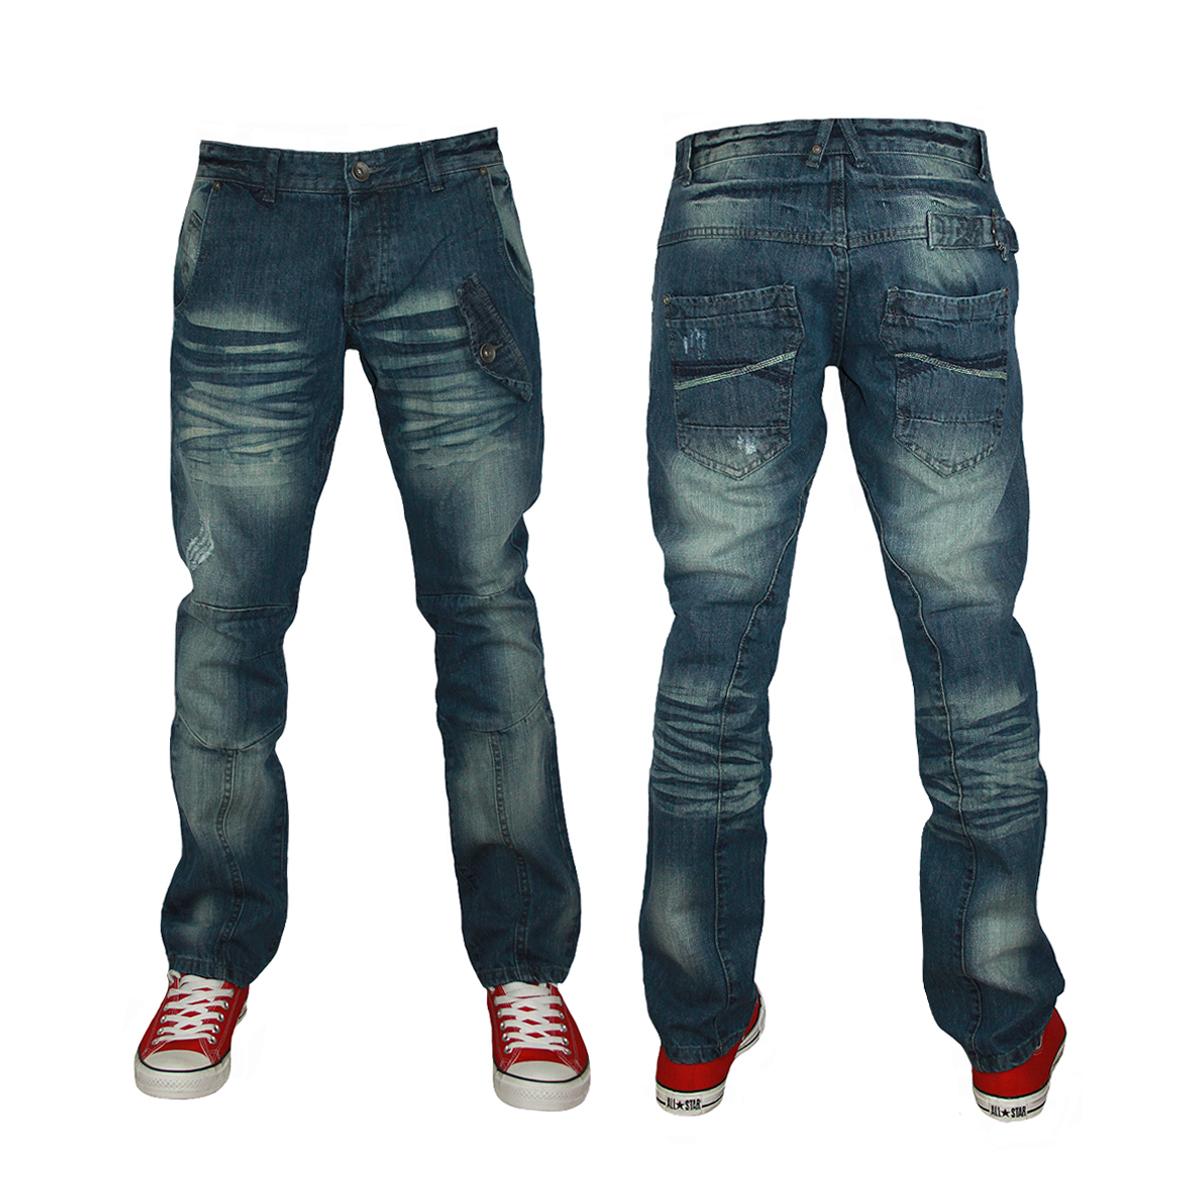 New Mens Zico Jeans Illy Designer Branded Regular Fit Jeans All Waist Leg Size Ebay